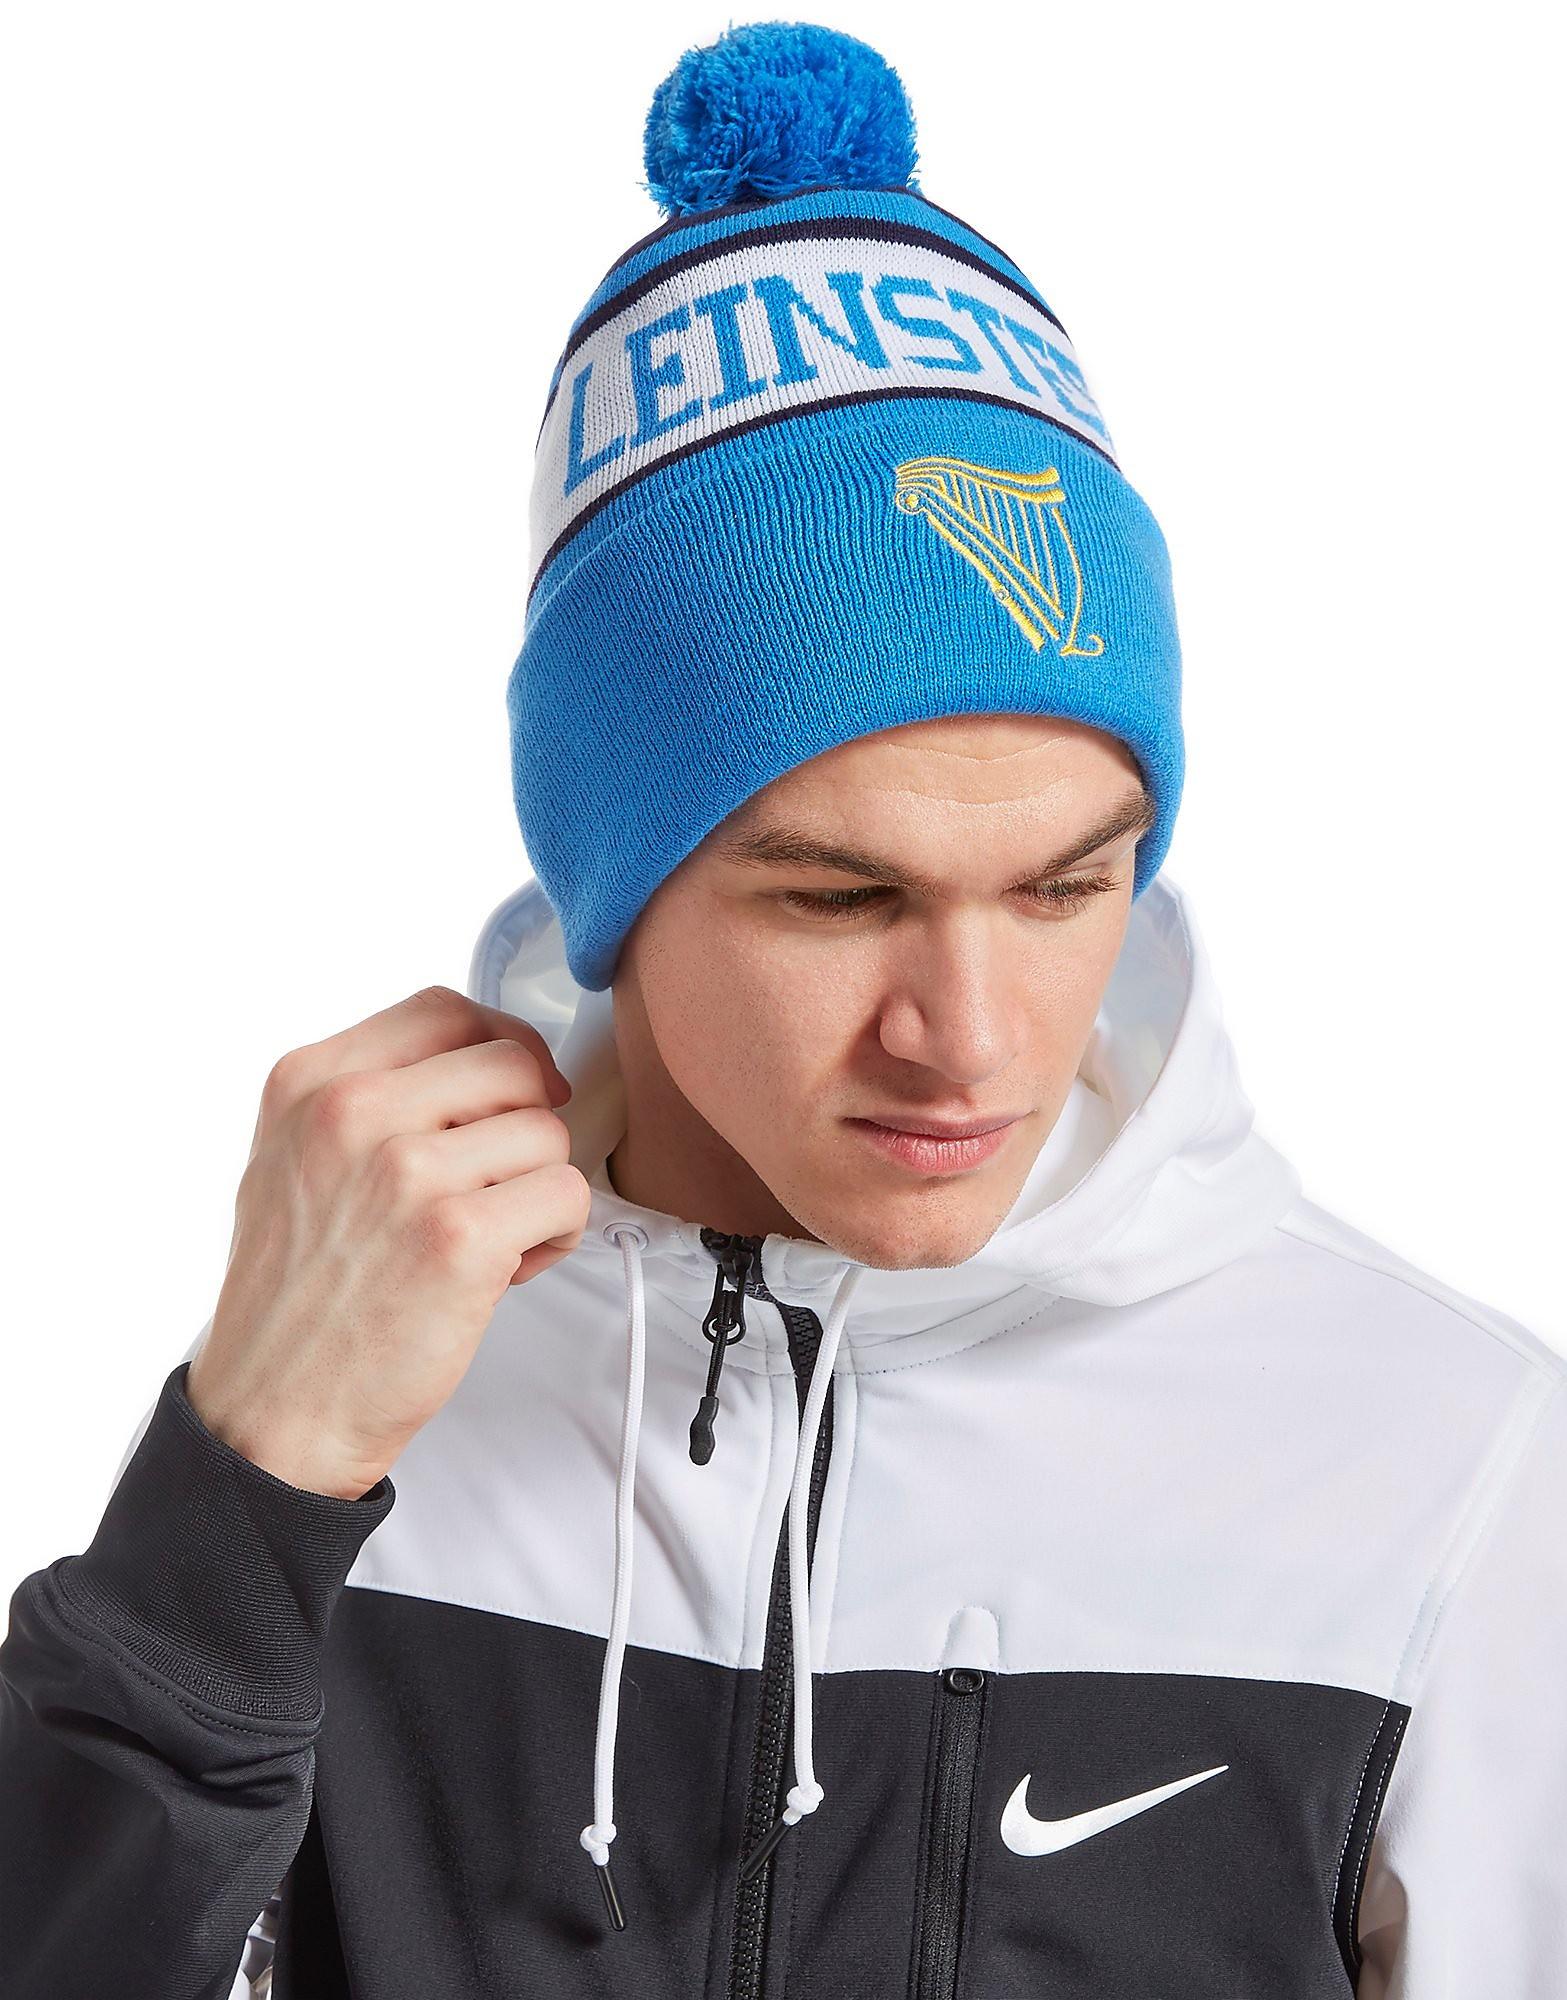 Official Team Leinster Beanie Hat